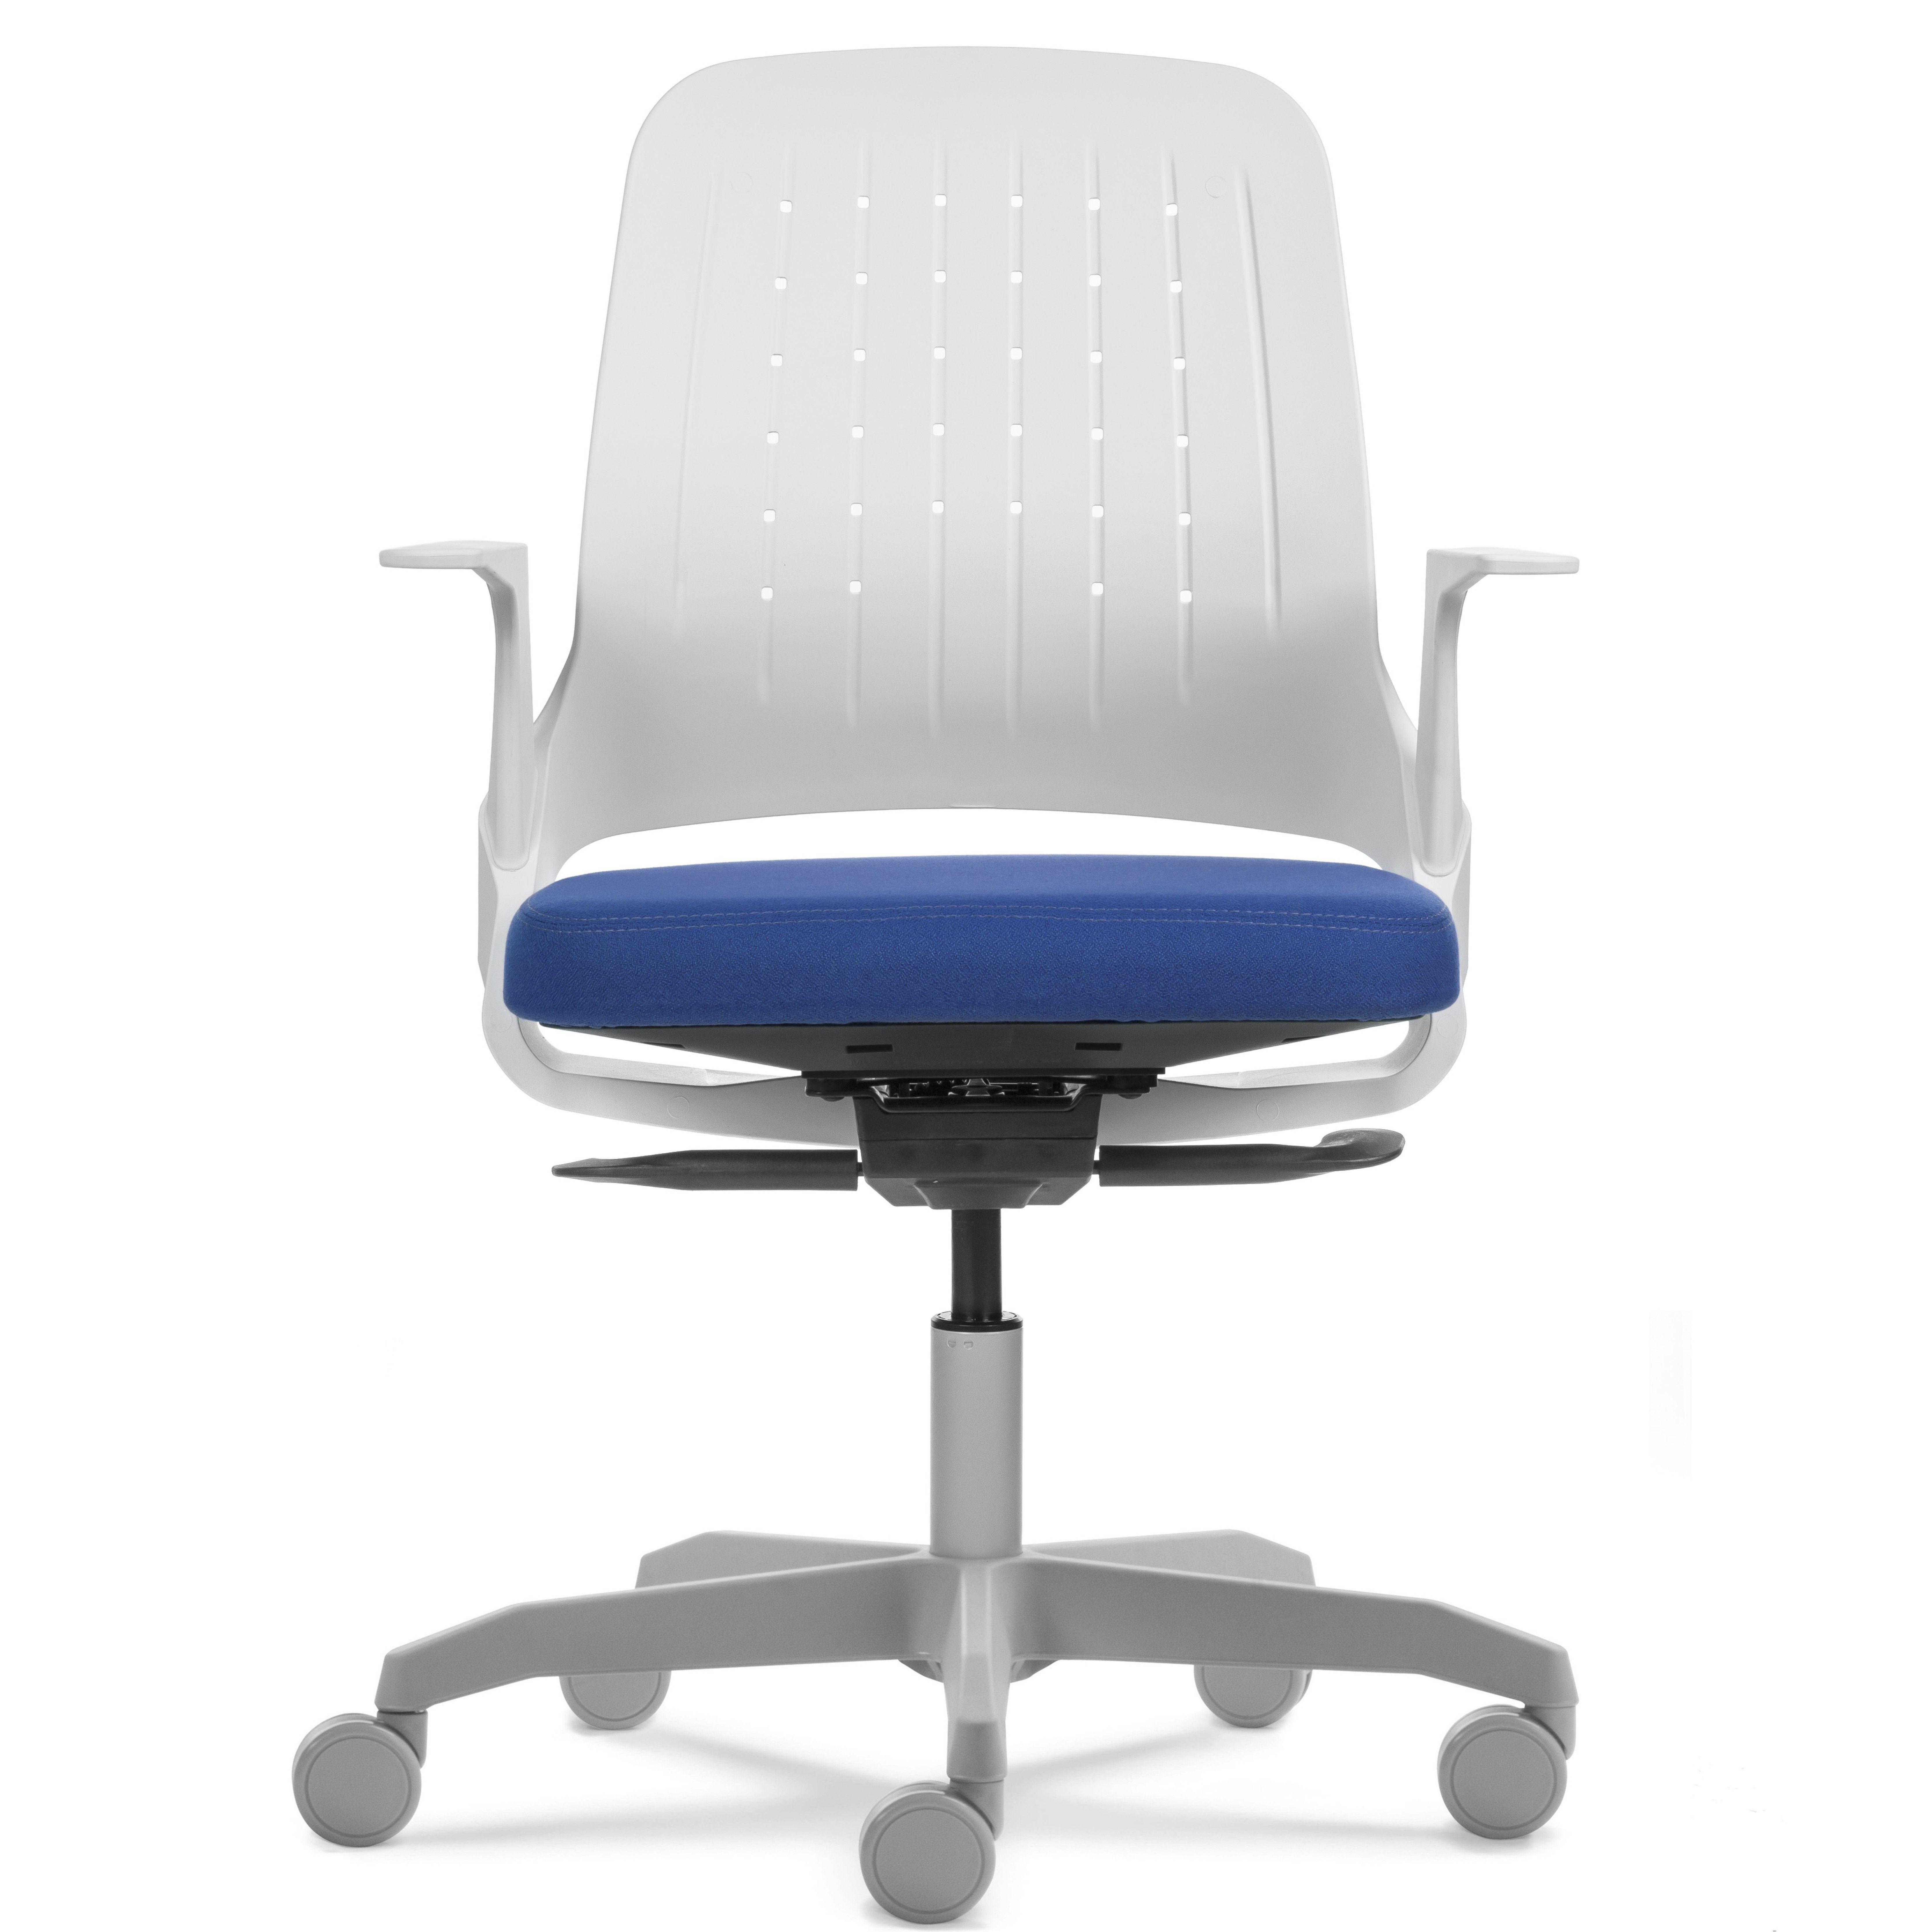 Cadeira My Chair Sapphire Blue